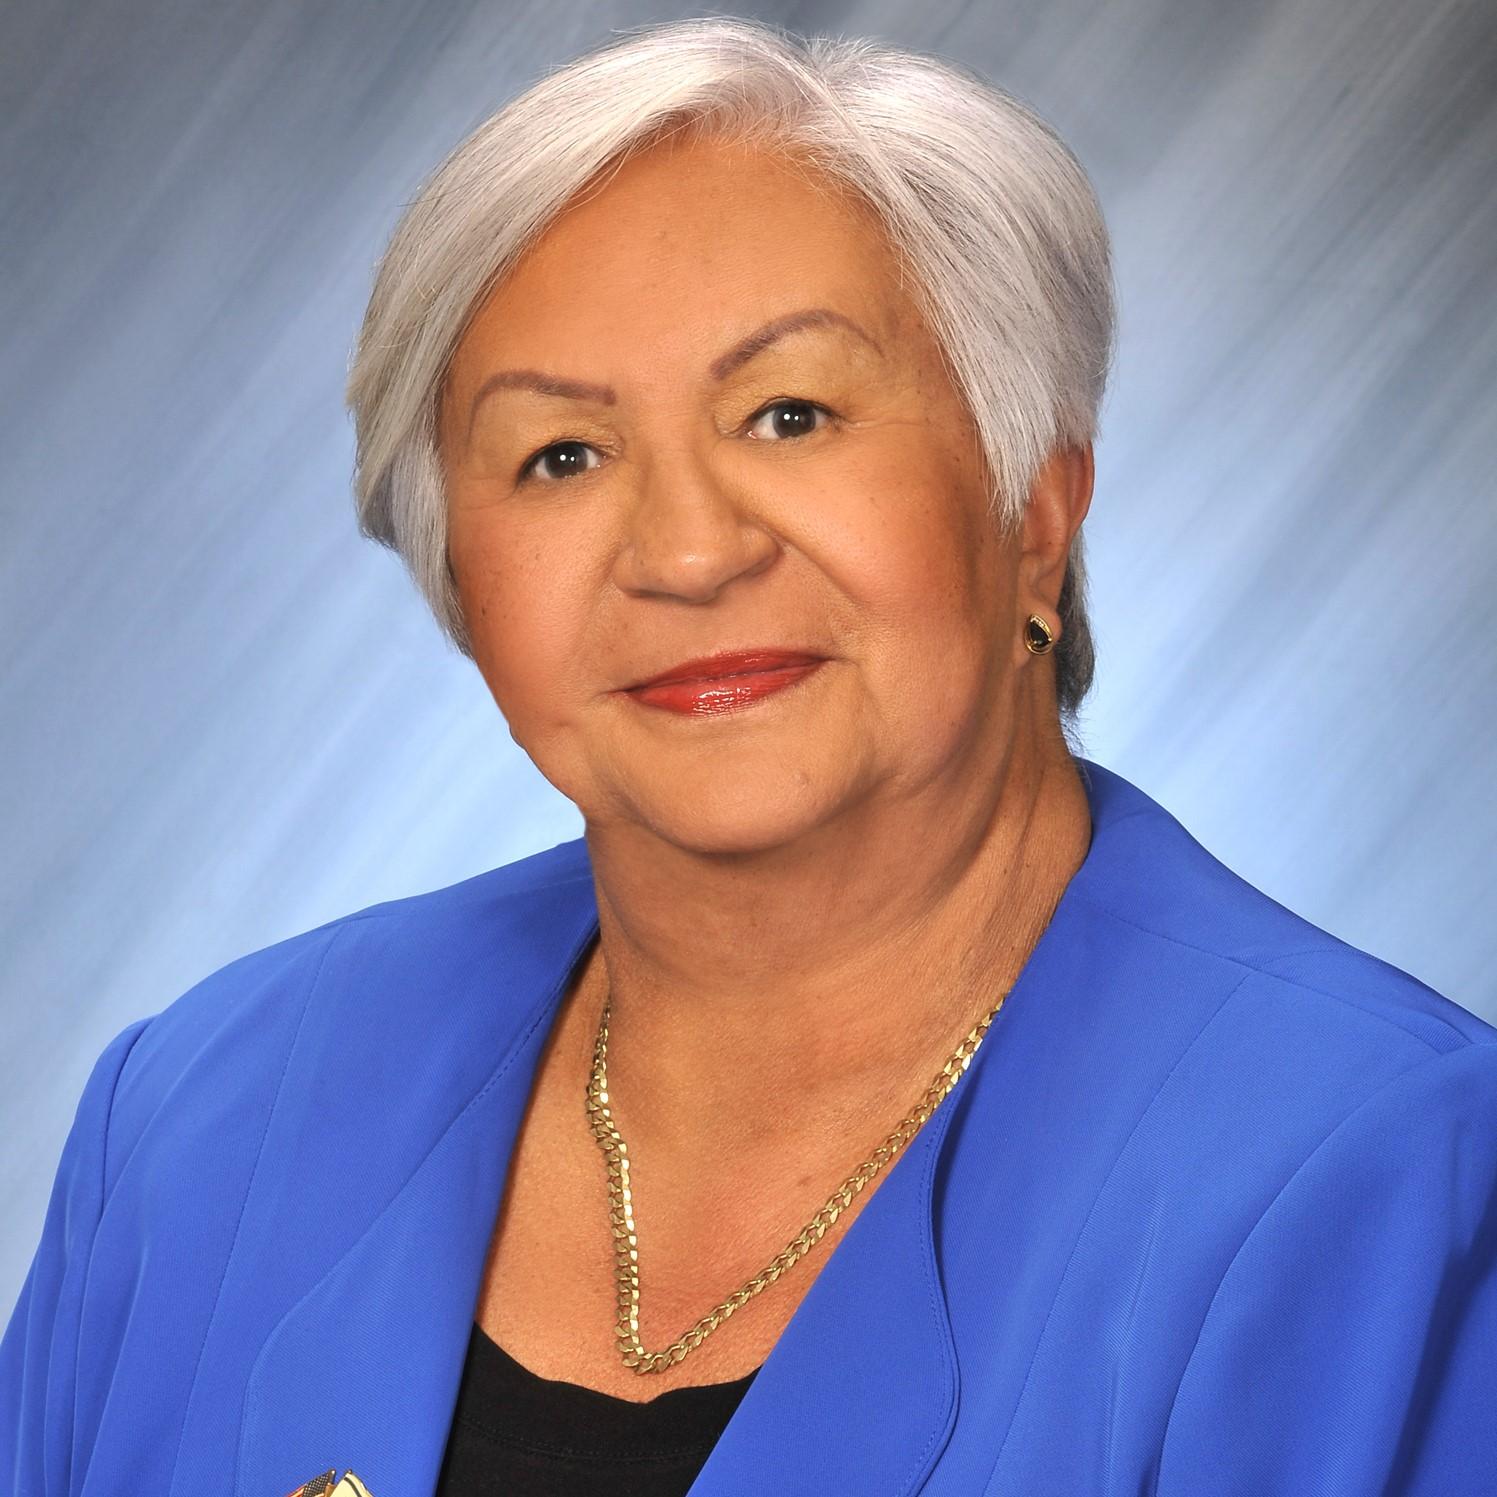 The Honorable Olga Gonzalez